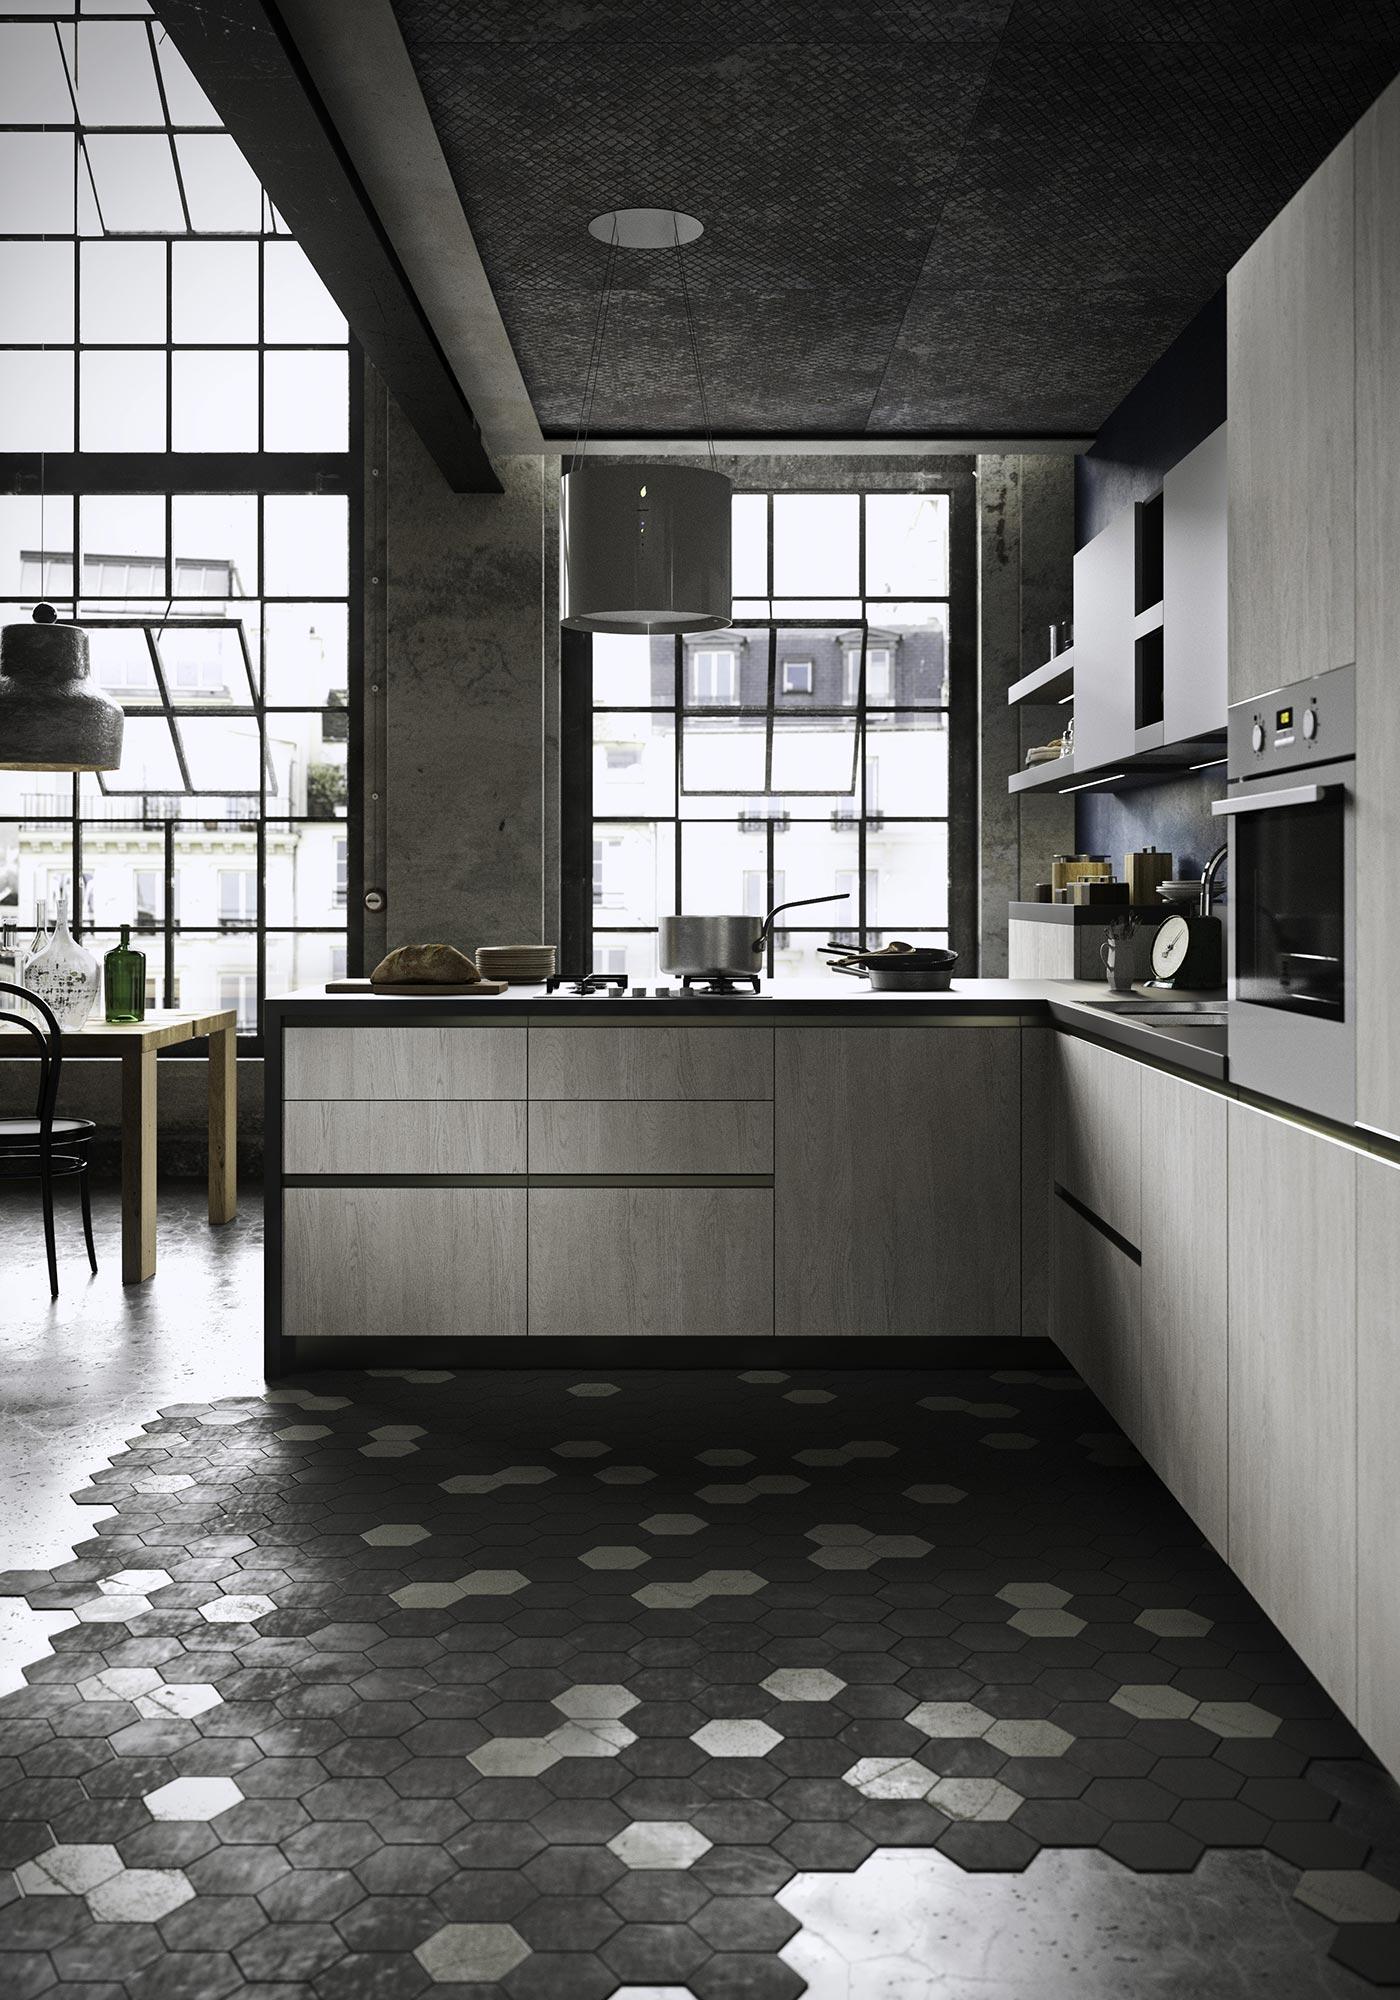 joy cuisine jm cuisines cuisiniste orsay bagneux. Black Bedroom Furniture Sets. Home Design Ideas